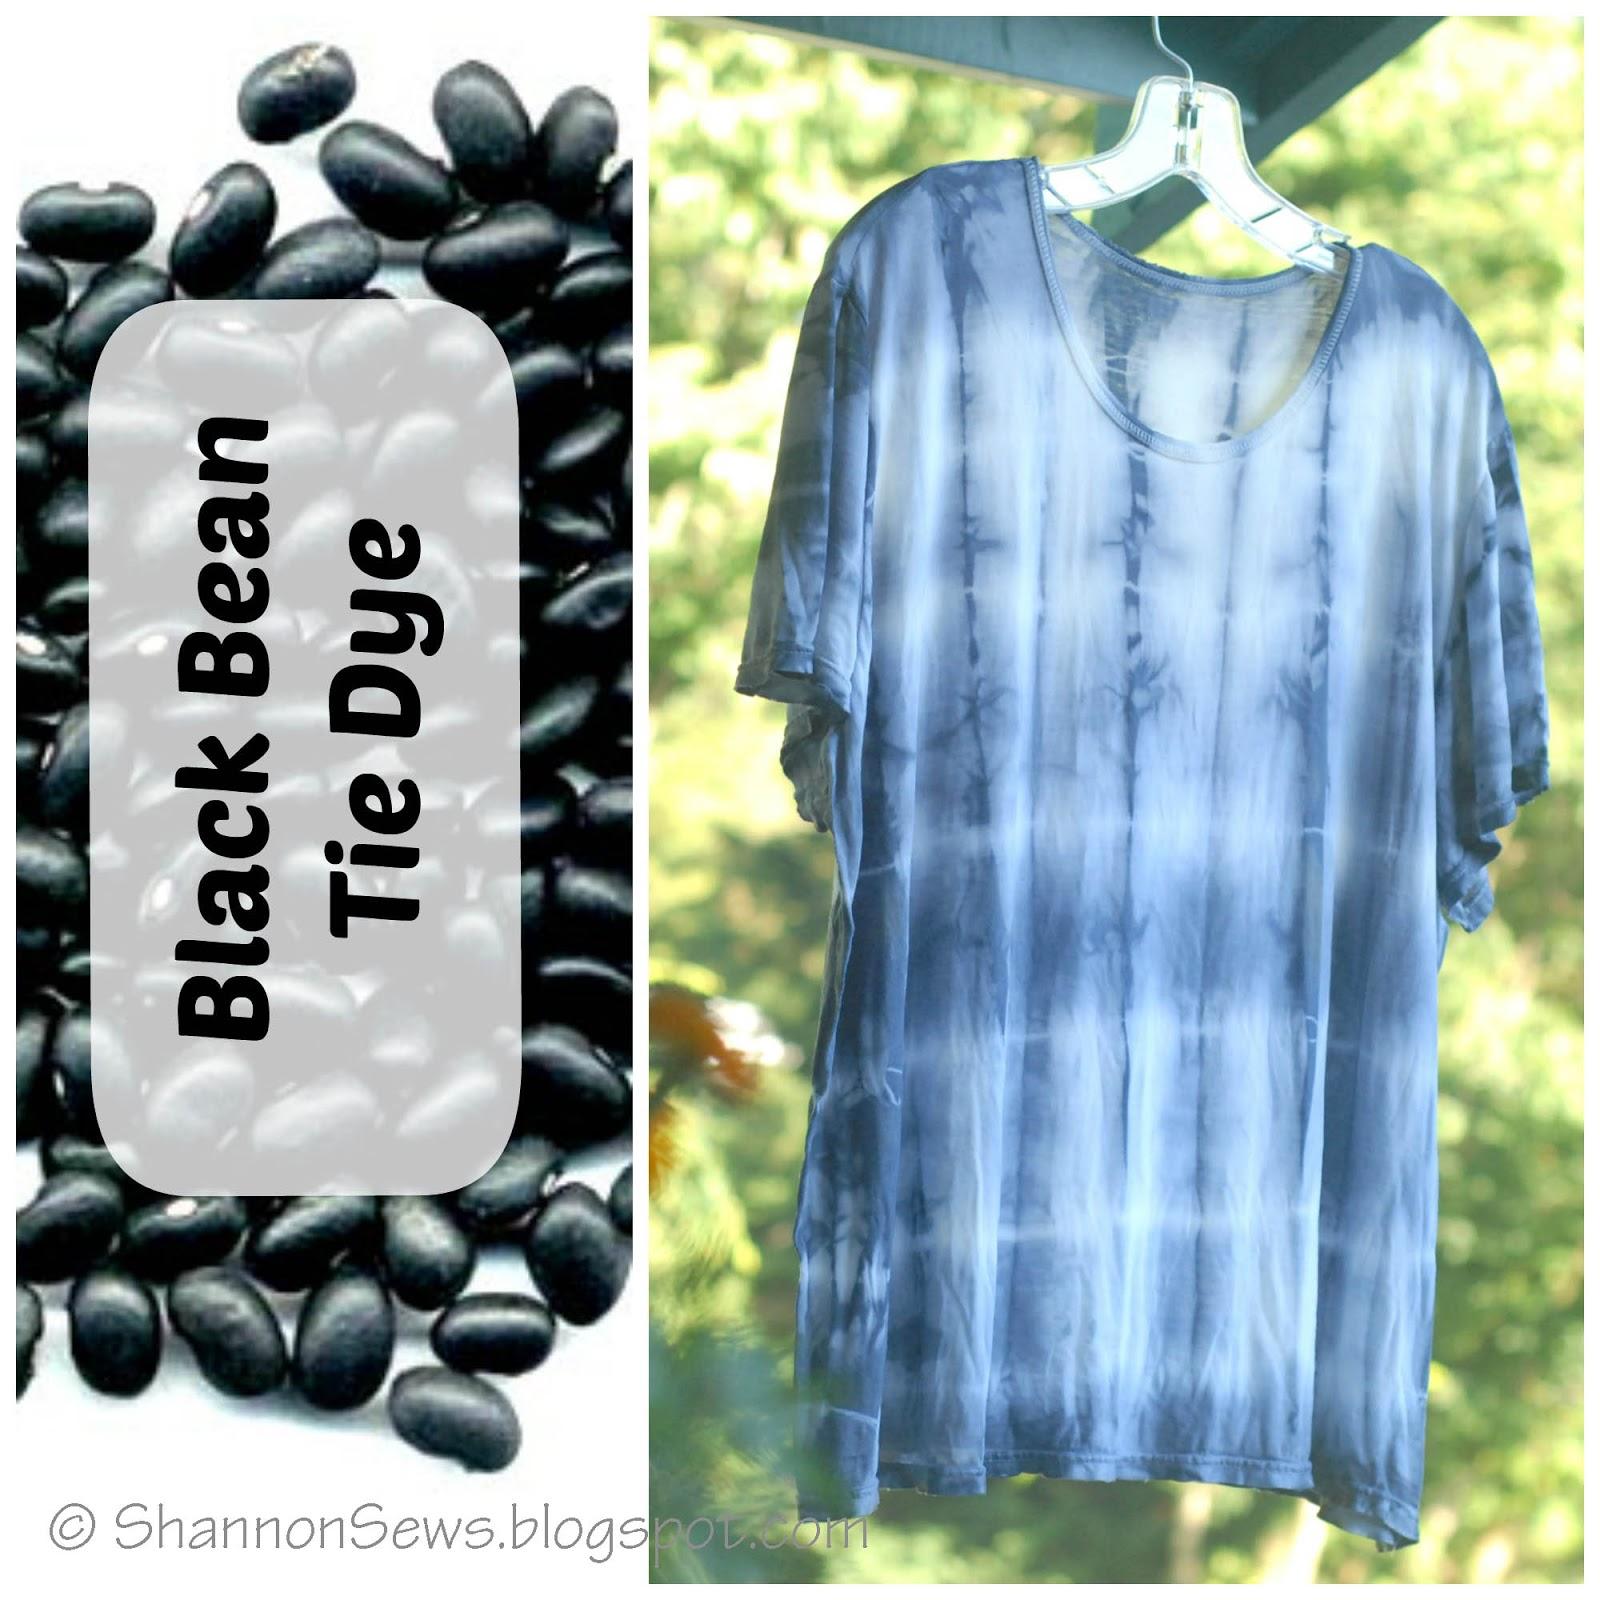 900fd578 Sewing, Tutorials, Crafts, DIY, Handmade | Shannon Sews | blog for ...